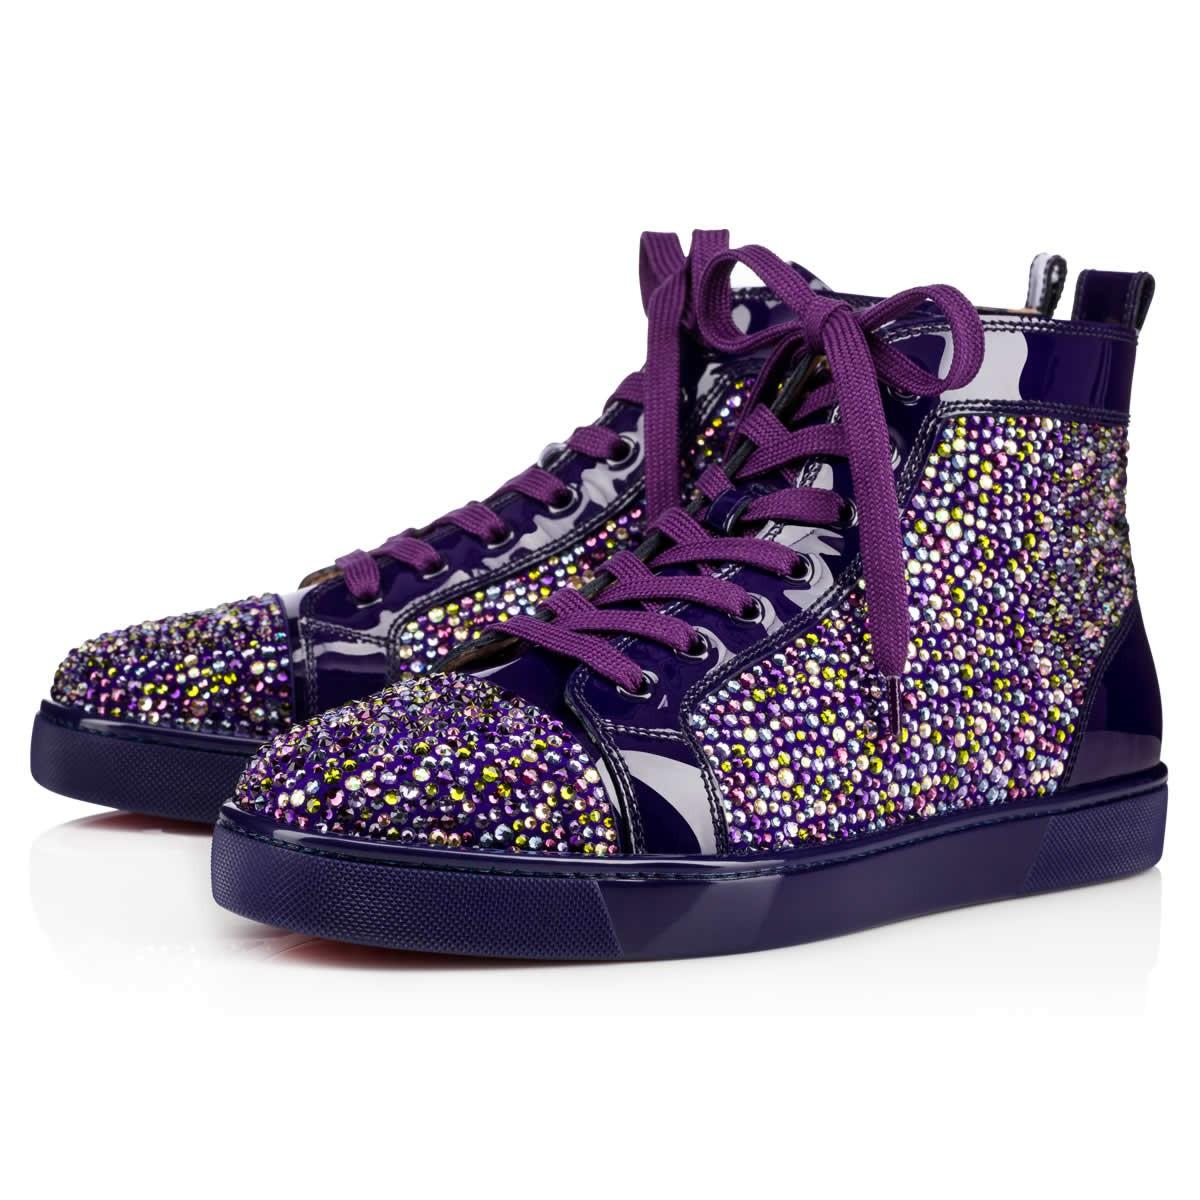 best website 3ce5f a2600 Louis Strass Men's Flat Version Purple Pop Strass - Men Shoes - Christian  Louboutin